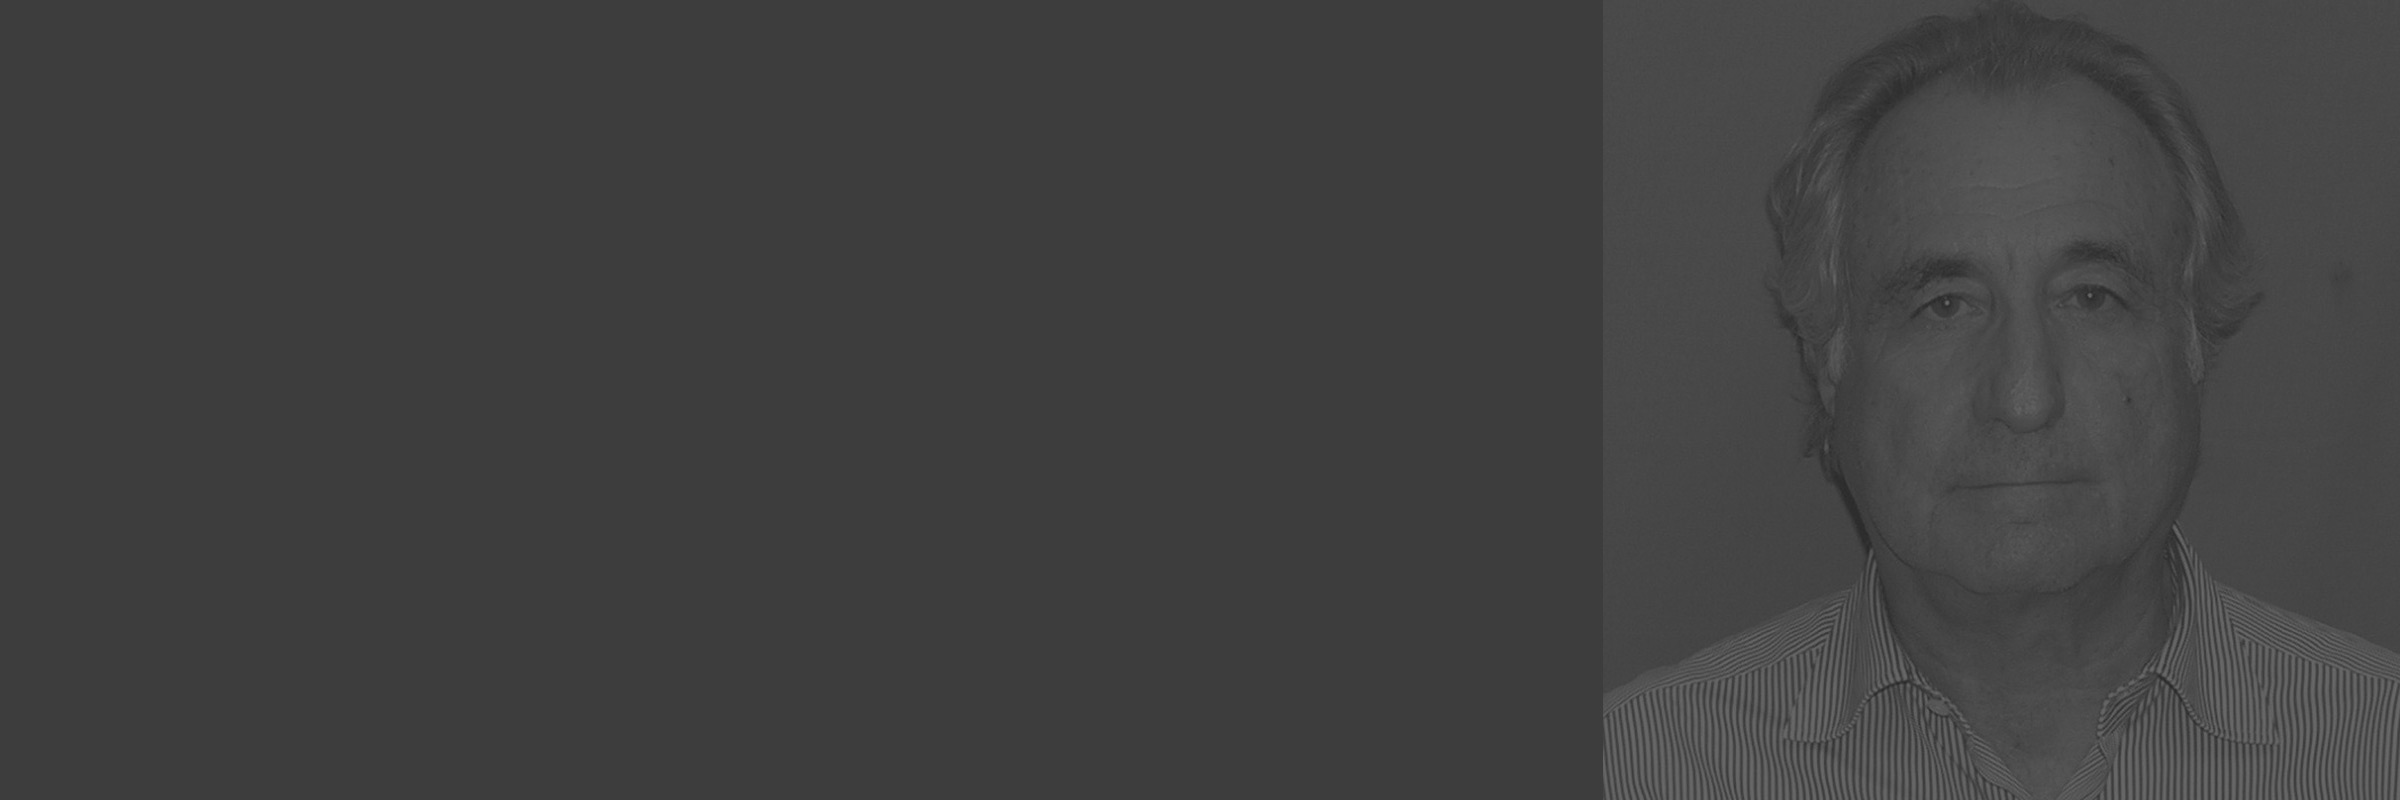 Pitfalls-banner-homepage2